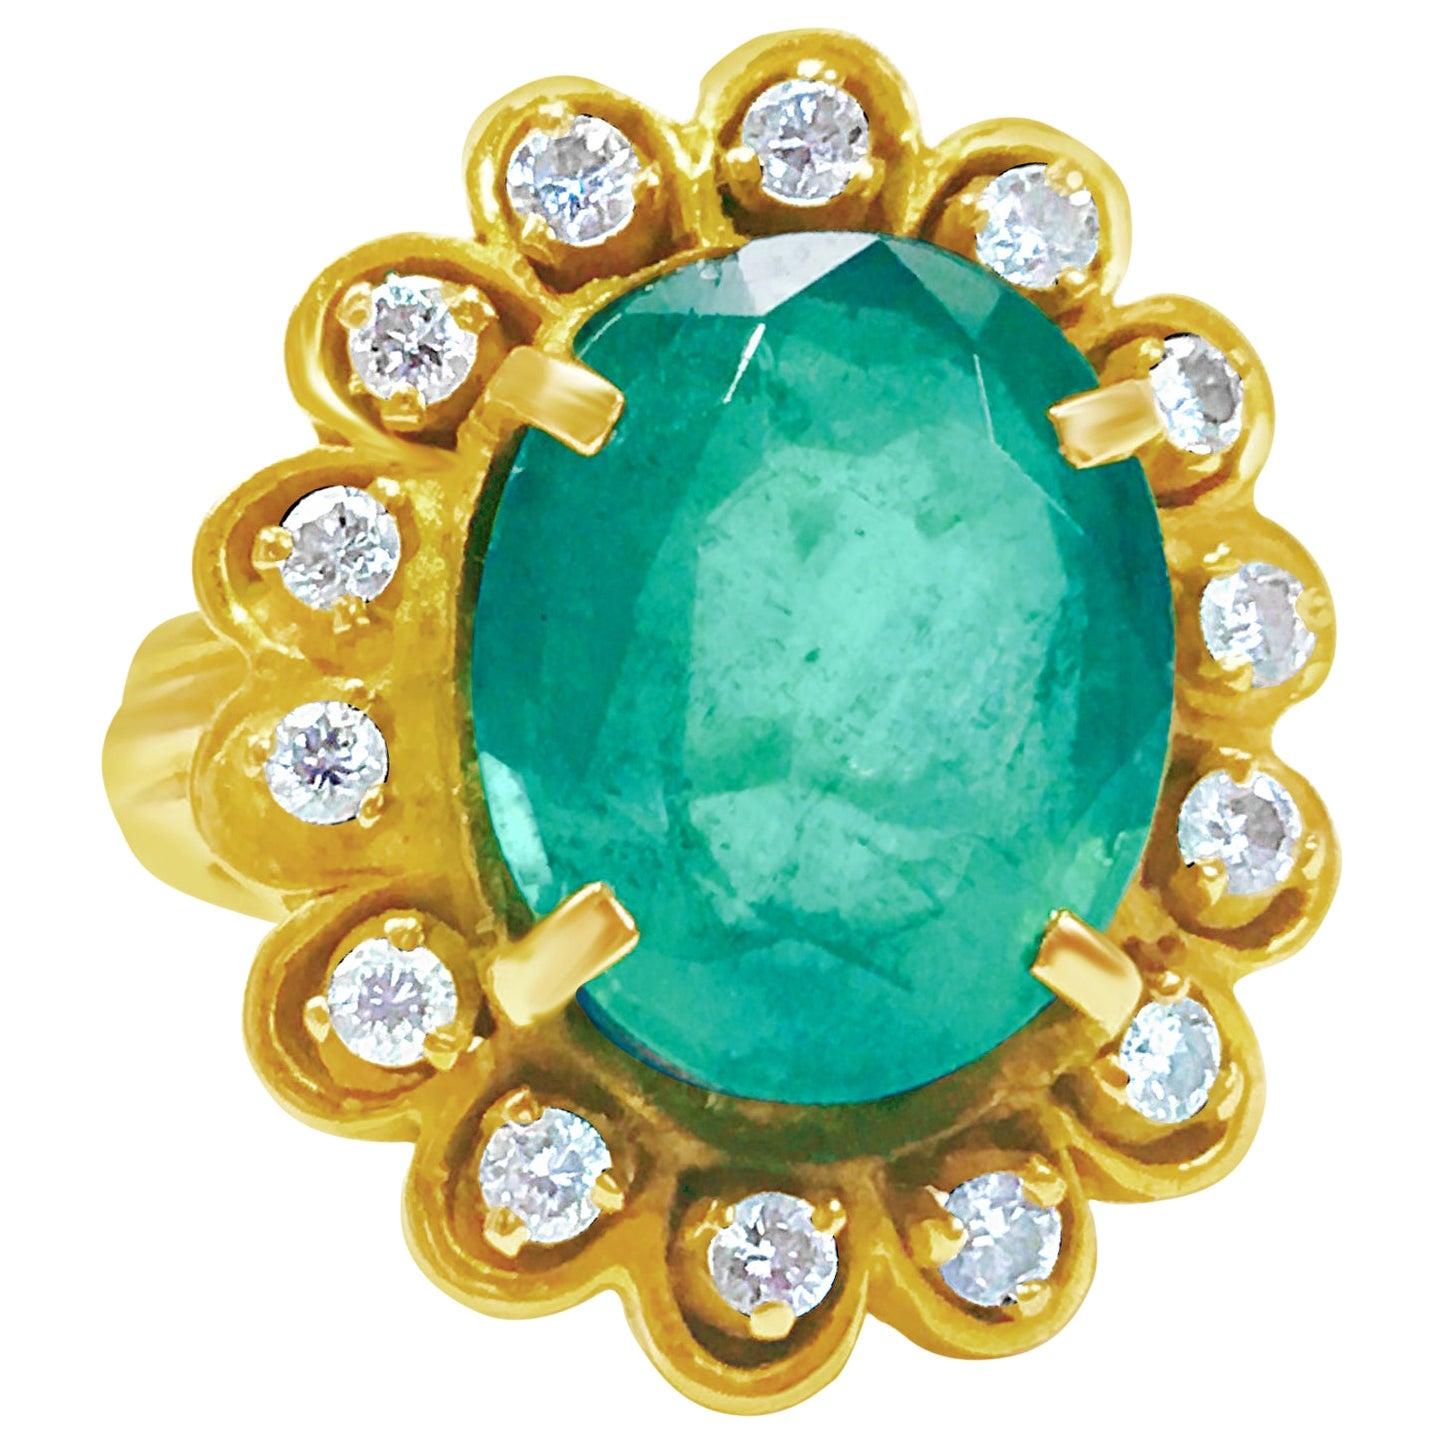 Vintage 5.50 Carat Natural Emerald and Diamond Ring